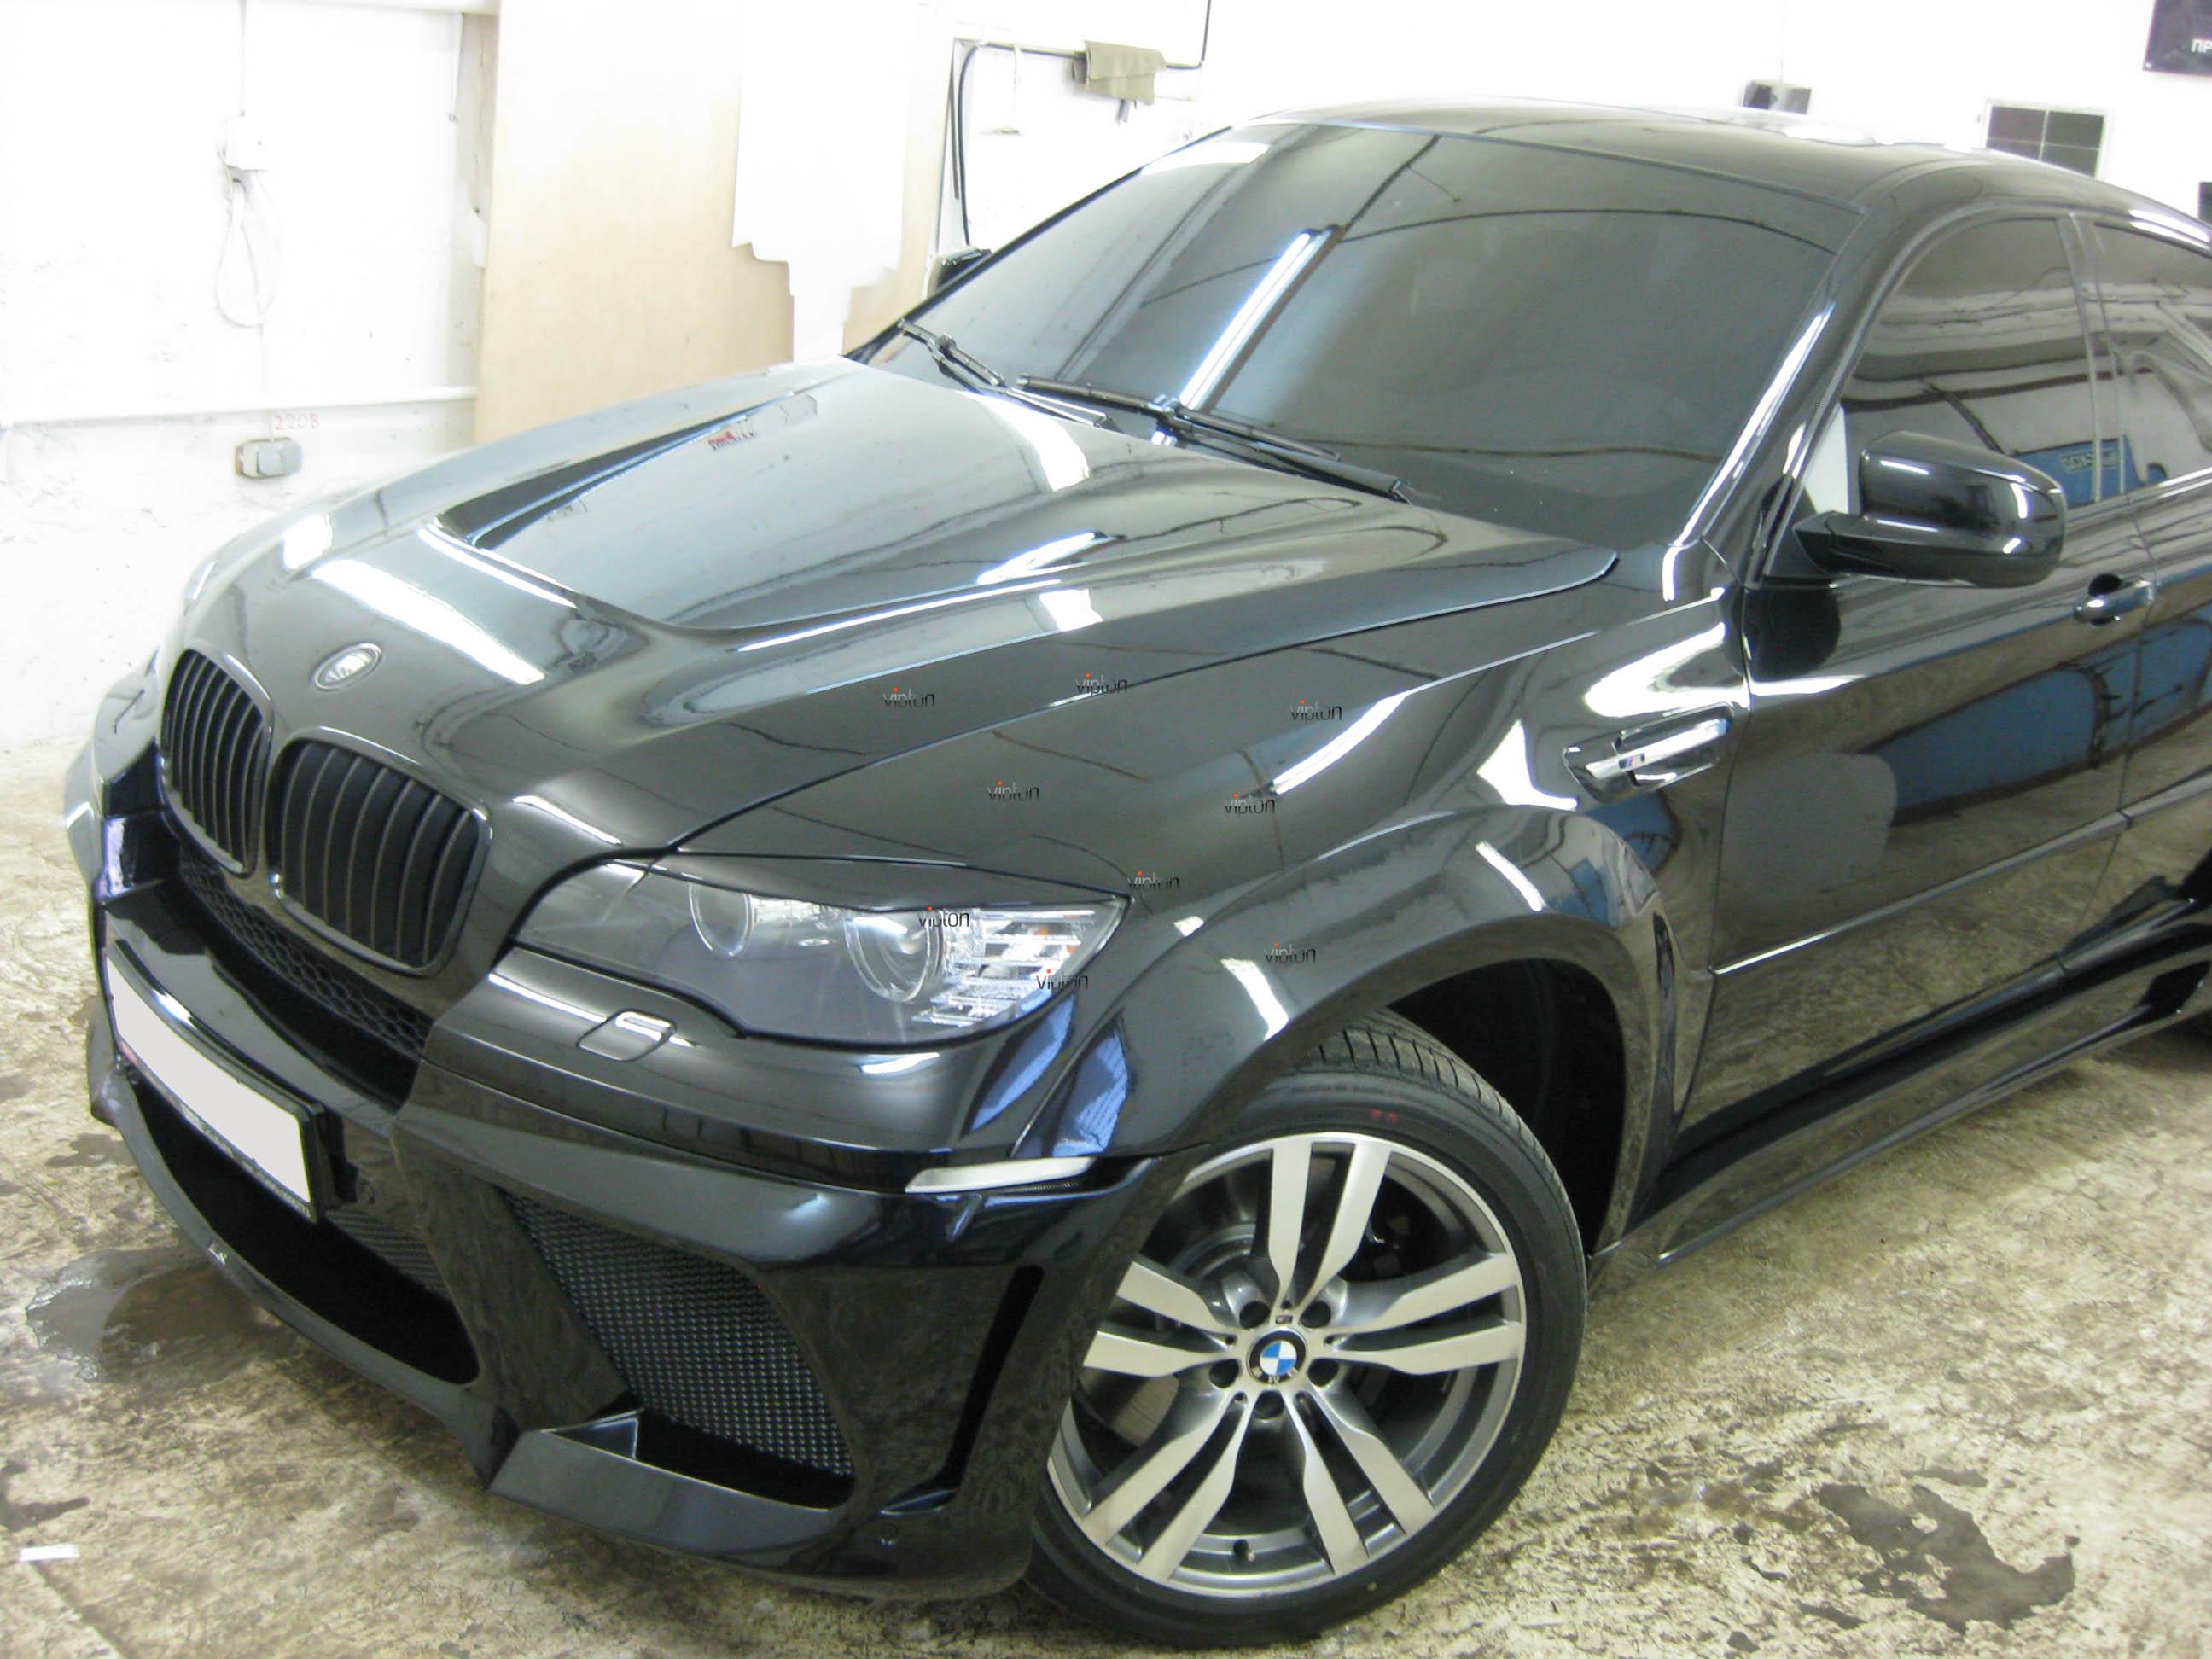 Автомобиль BMW Х6: Нанесение антигравийной пленки